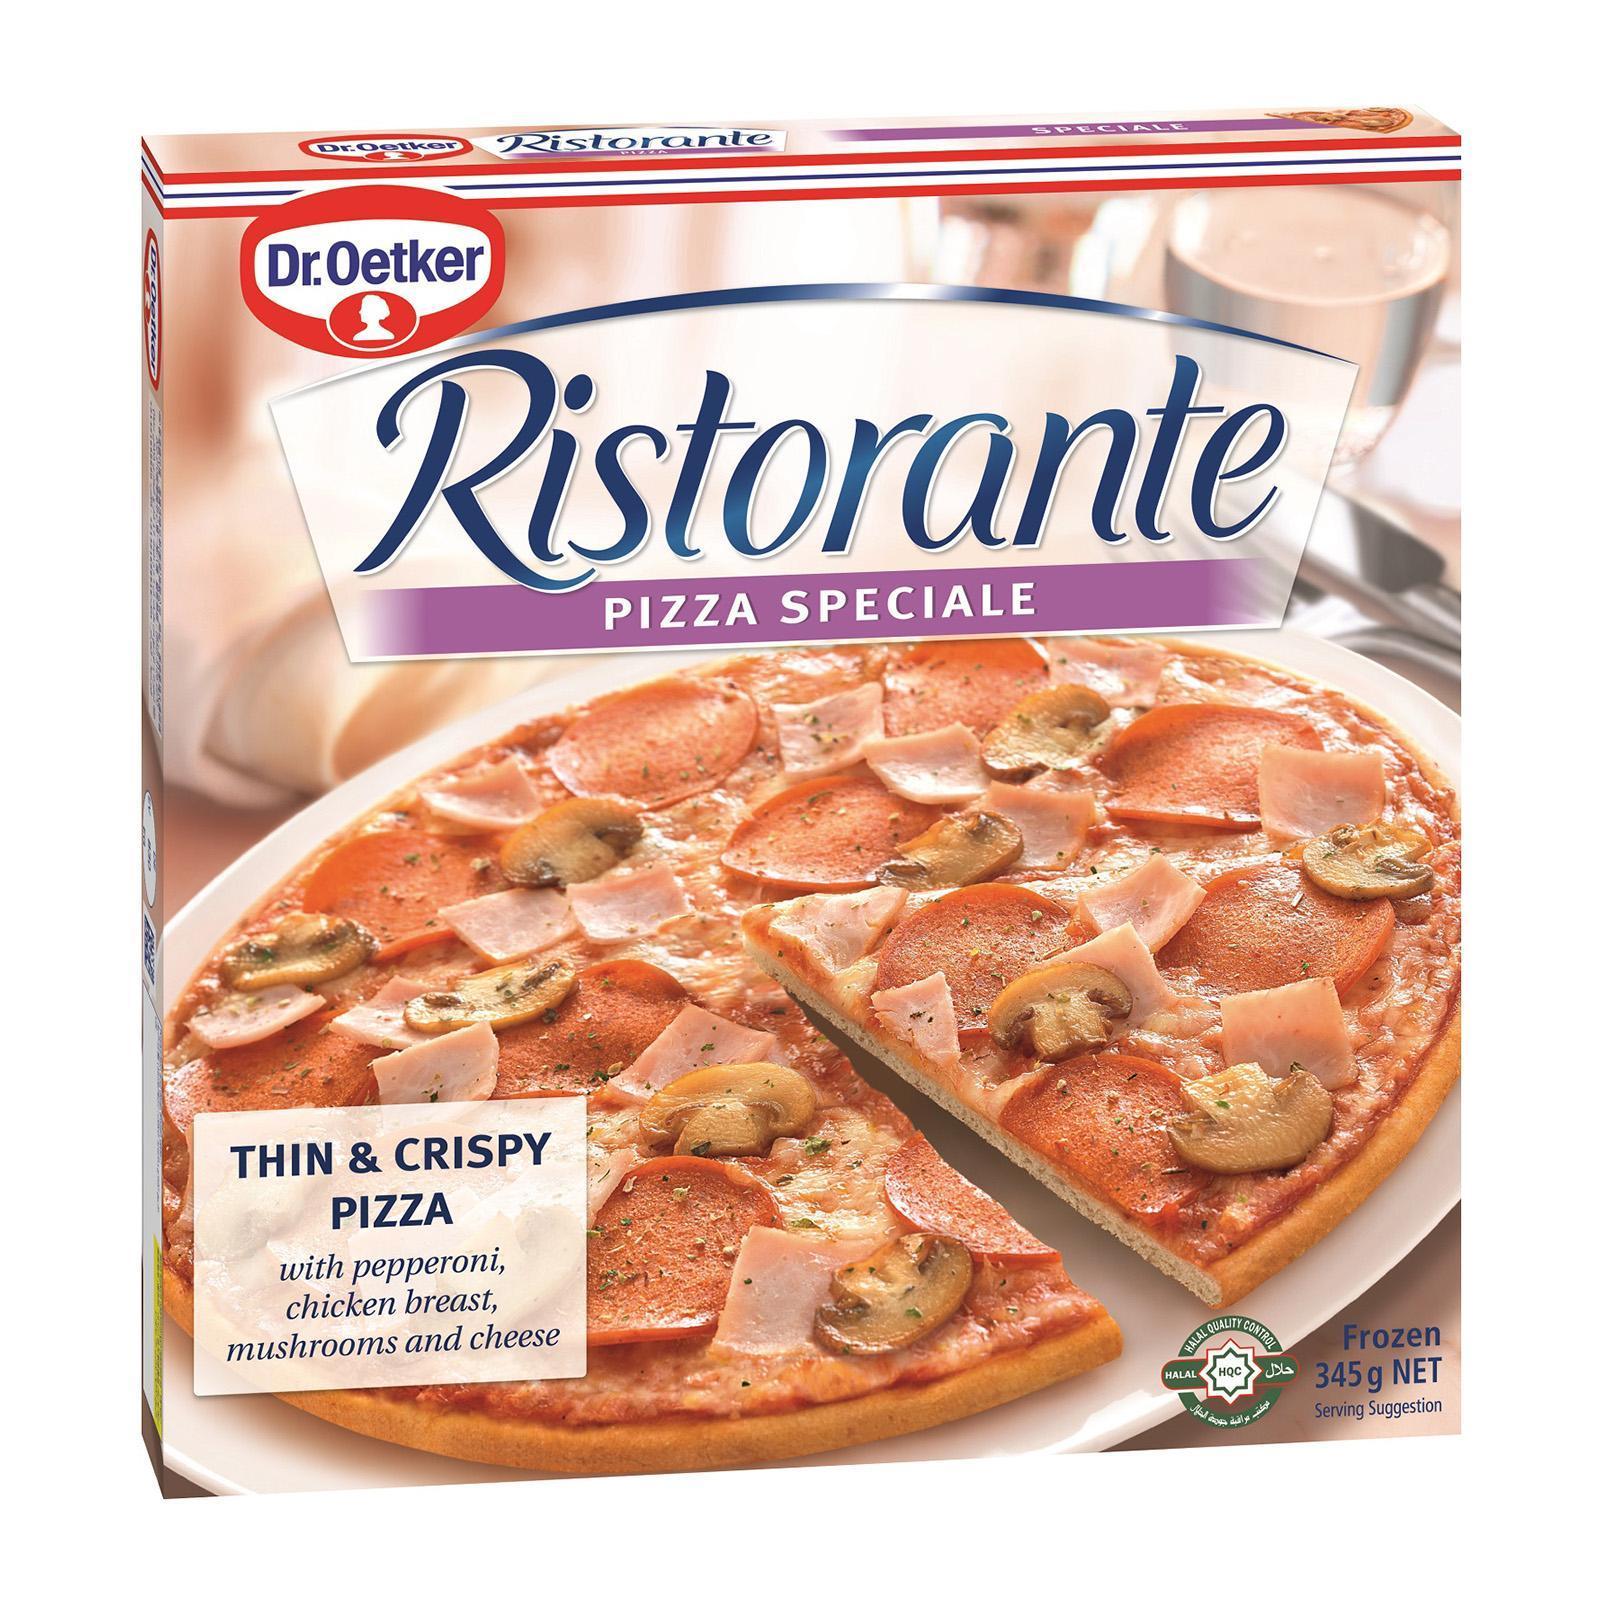 Dr Oetker Ristorante Pizza Speciale - Frozen By Redmart.